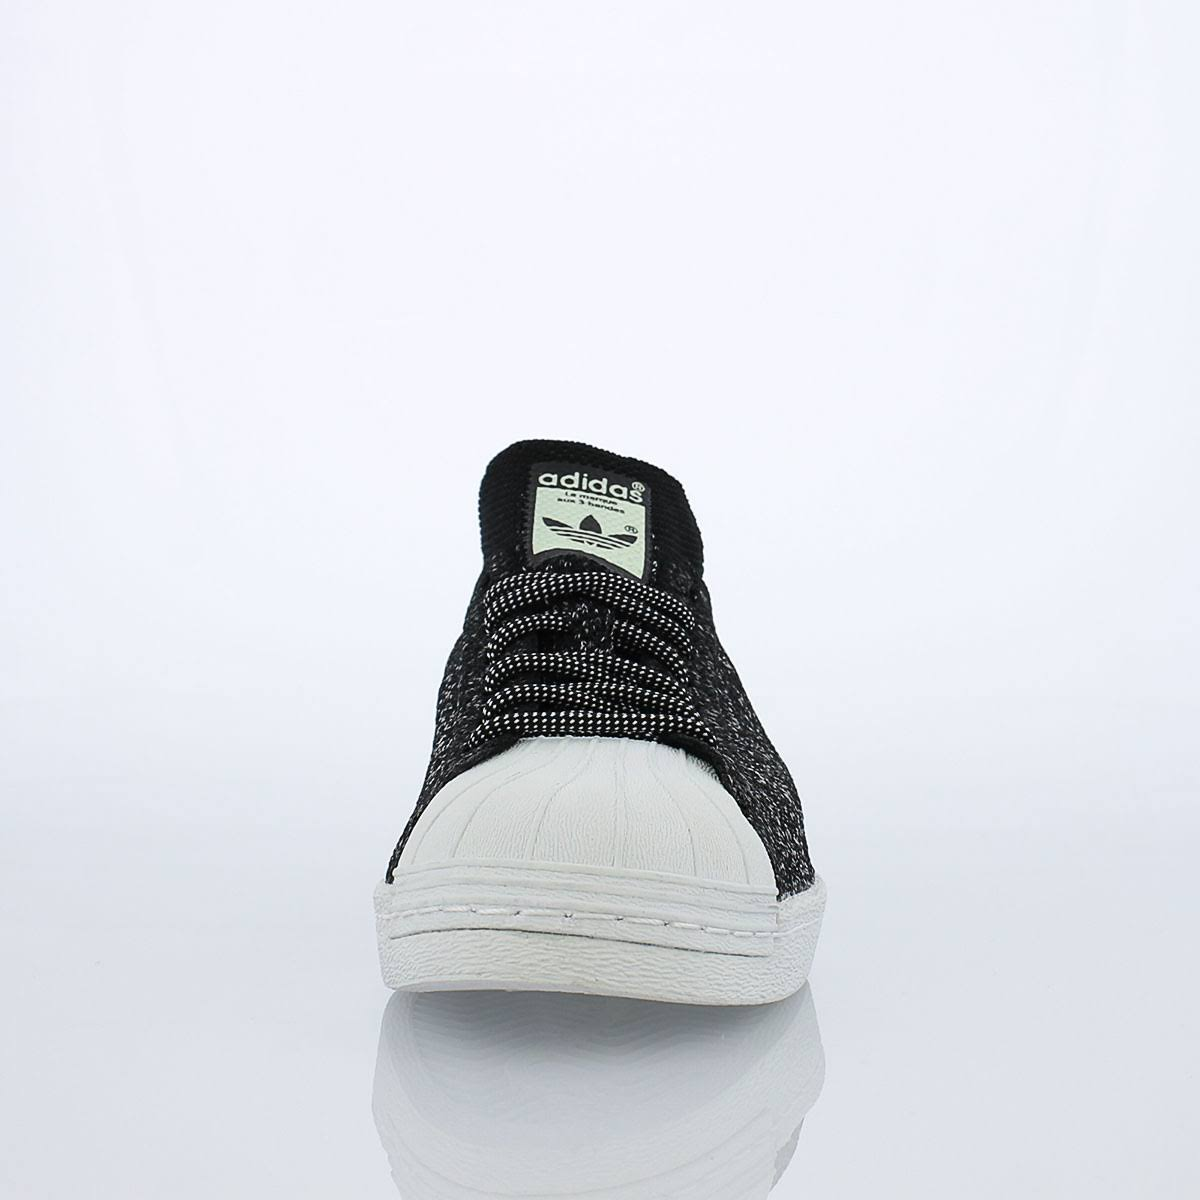 Superstar 'all Hombre Zapatillas Star' 9 Para Pk Adidas Tamaño 0 80s 0qIwr5FI